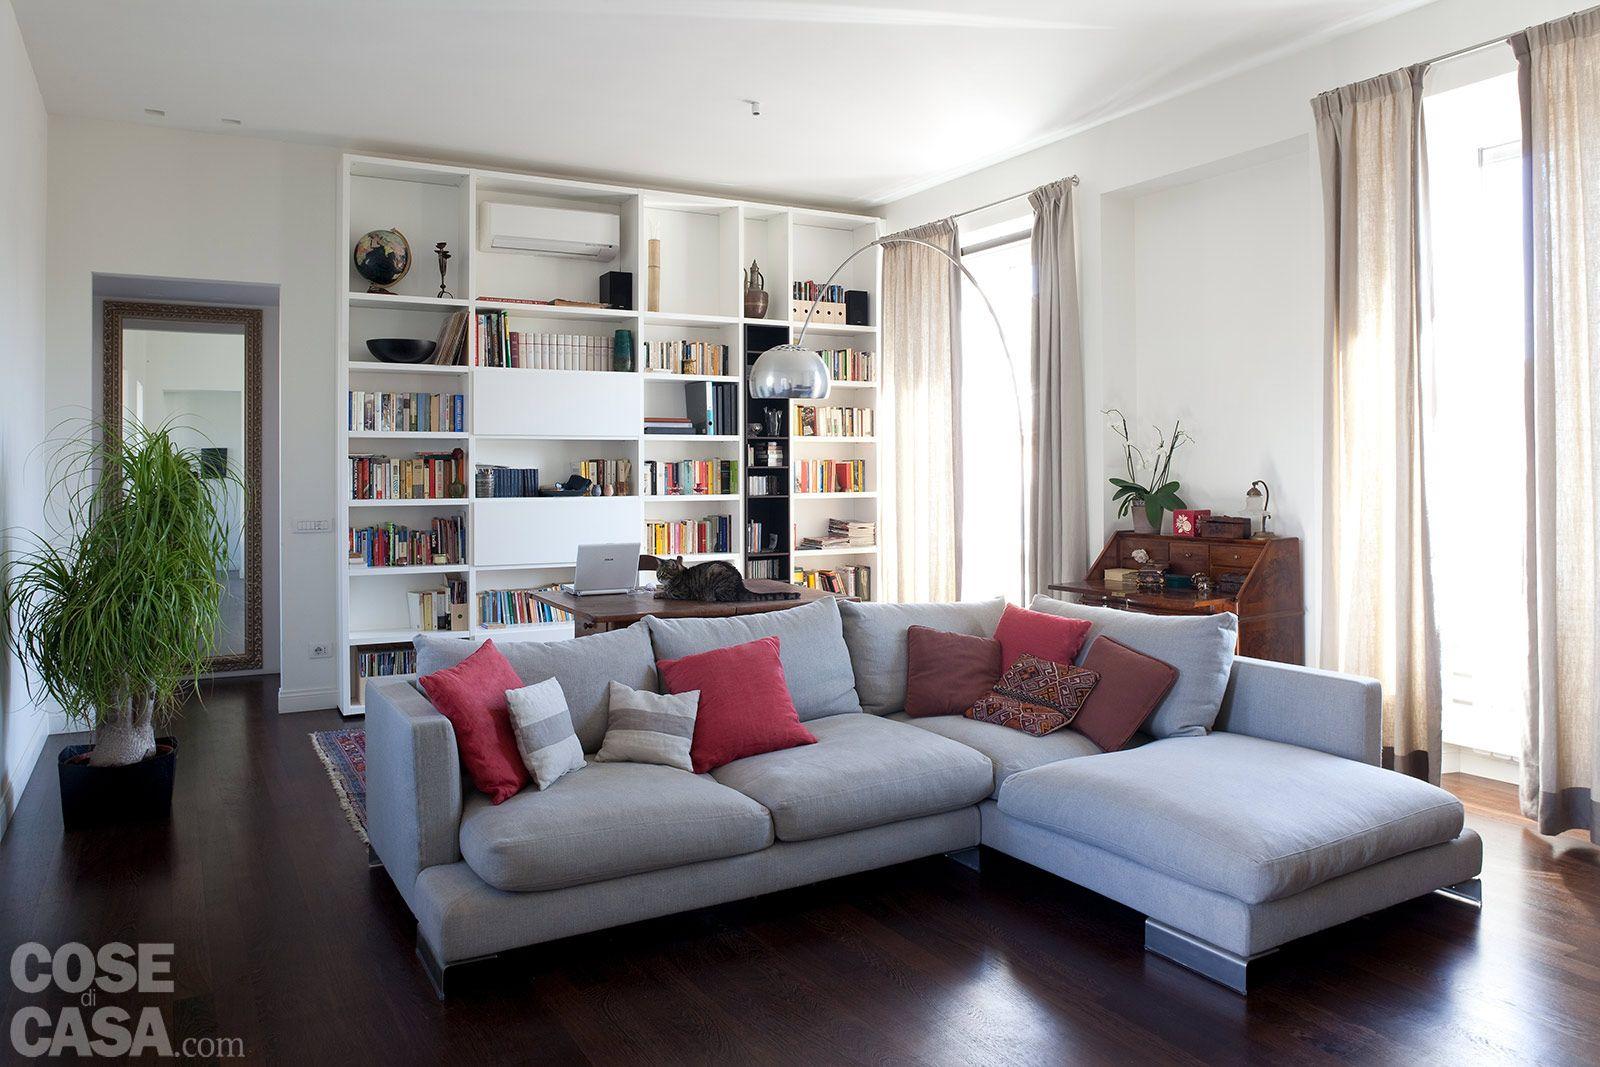 Favori Casa: 14 mq in più per il bilocale - Cose di Casa | casa  UP99